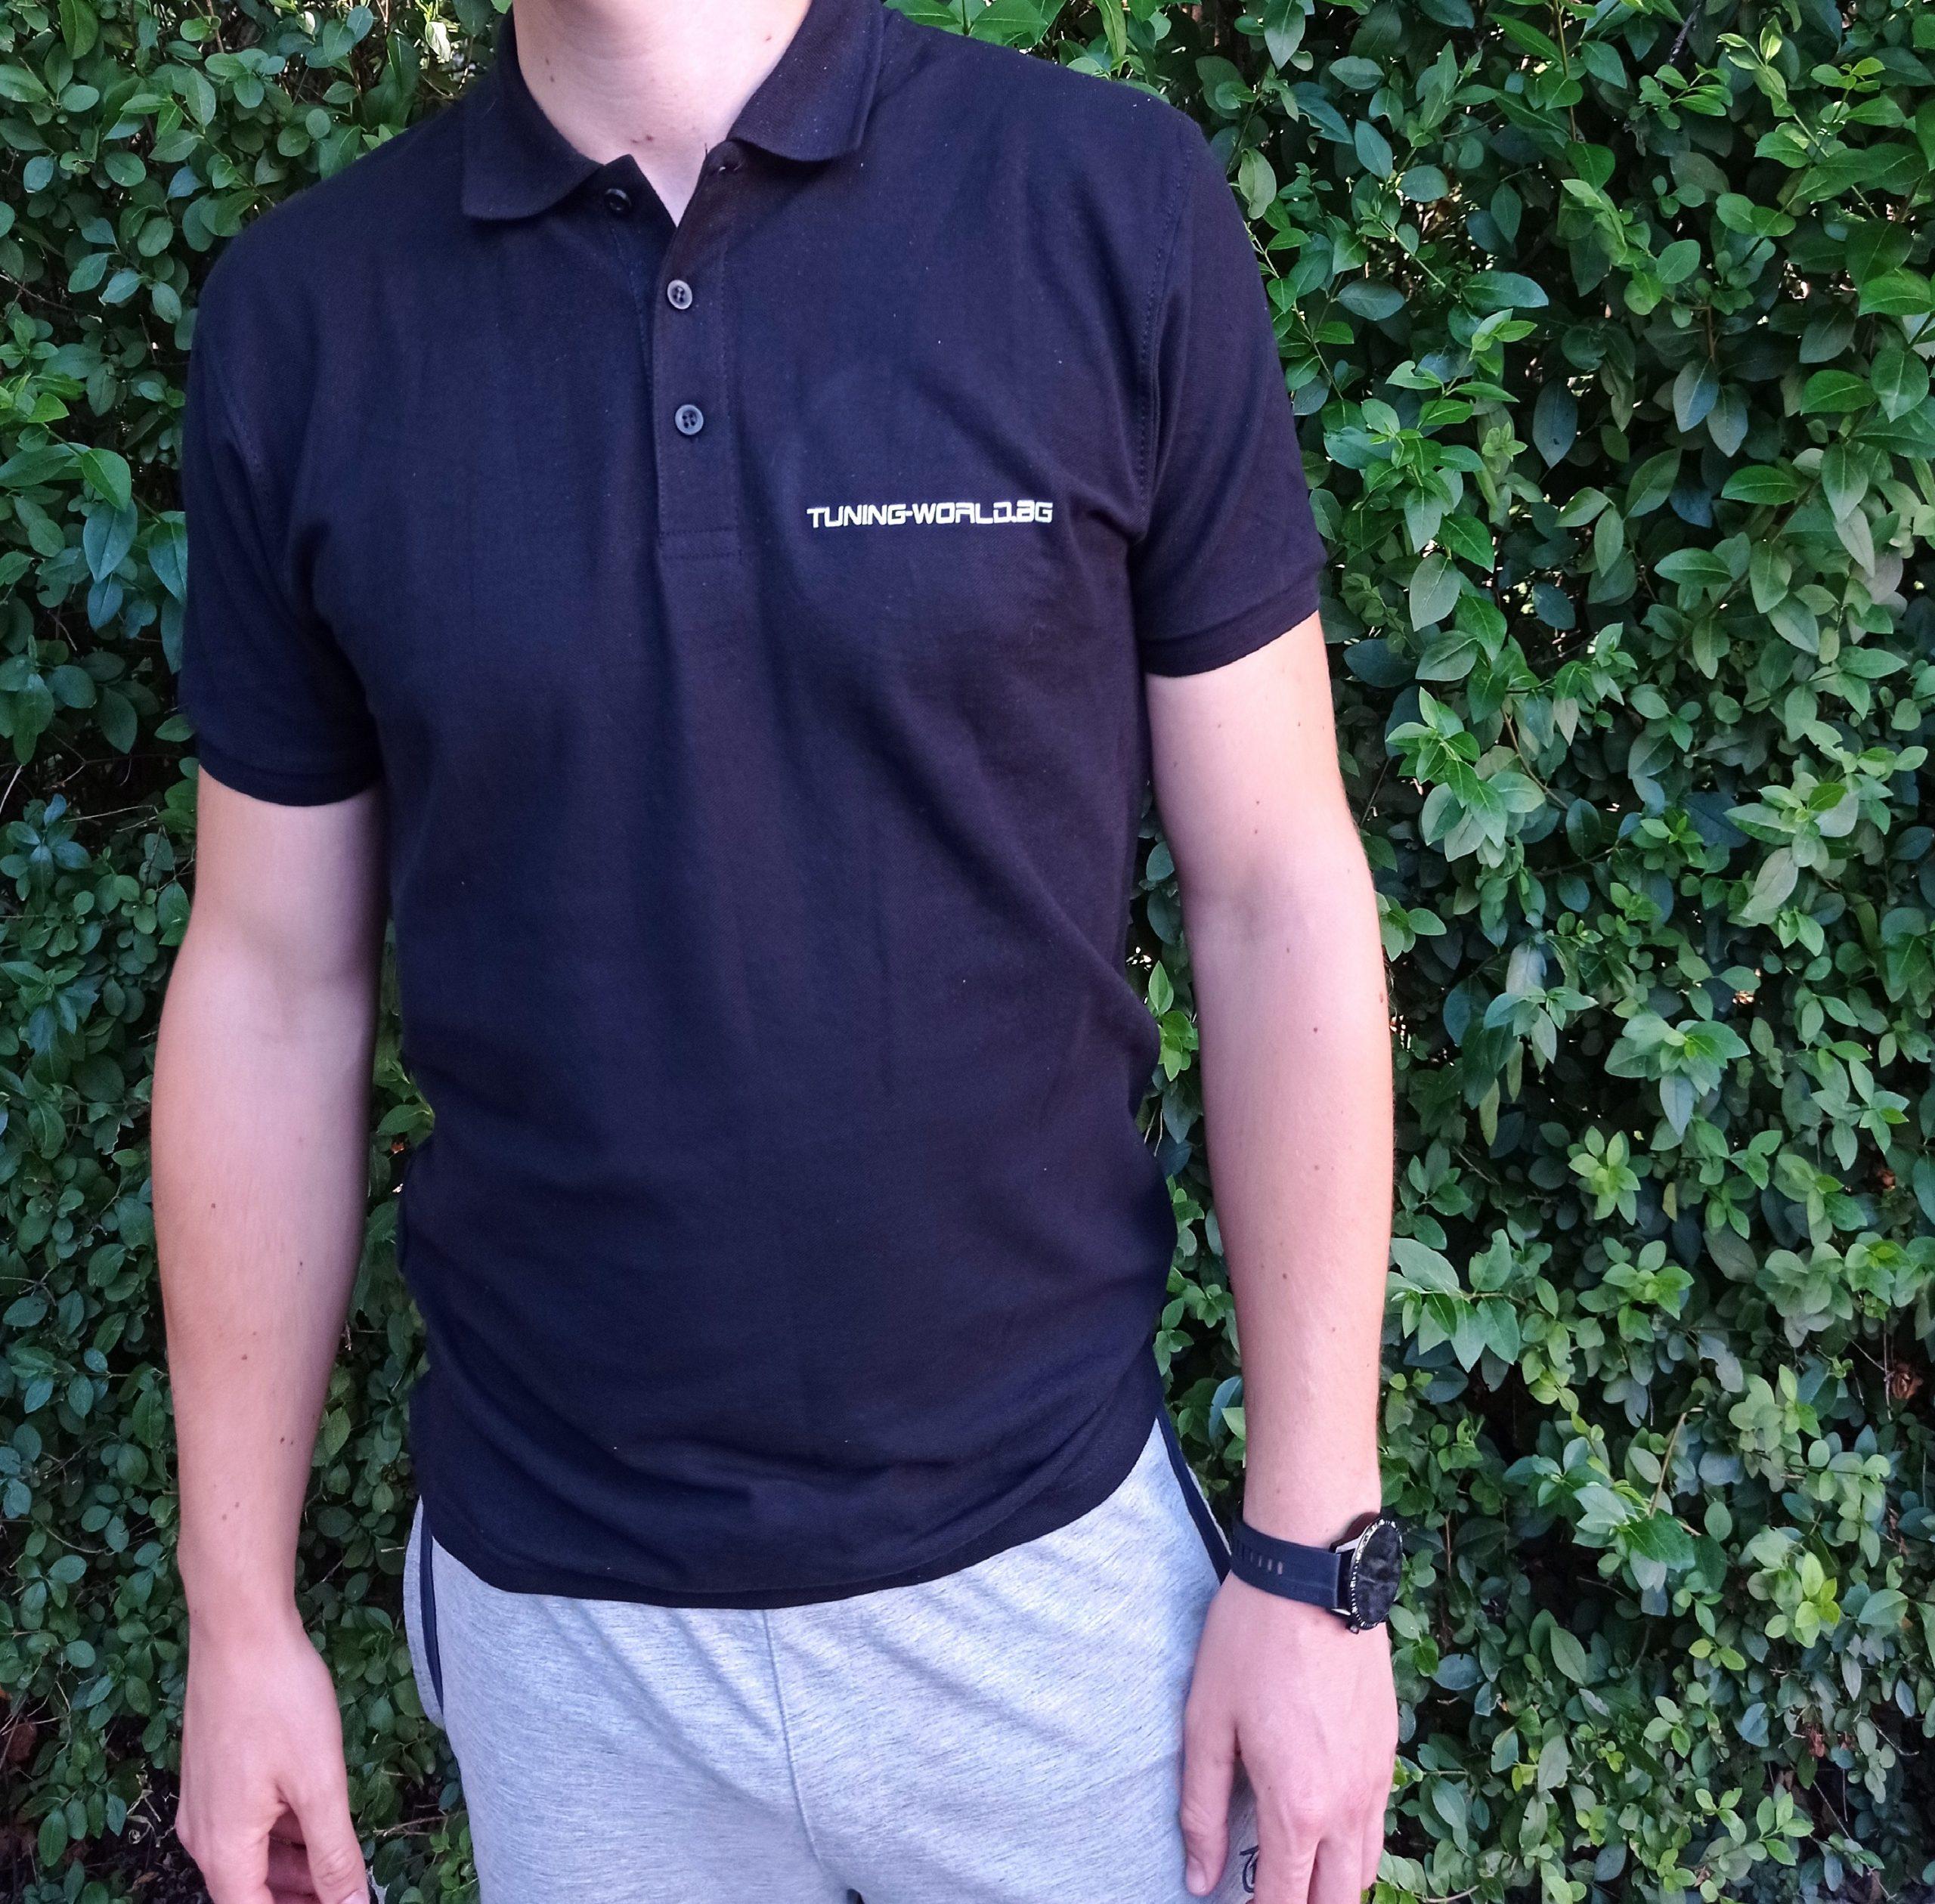 Tuning-world.bg Polo T-shirt